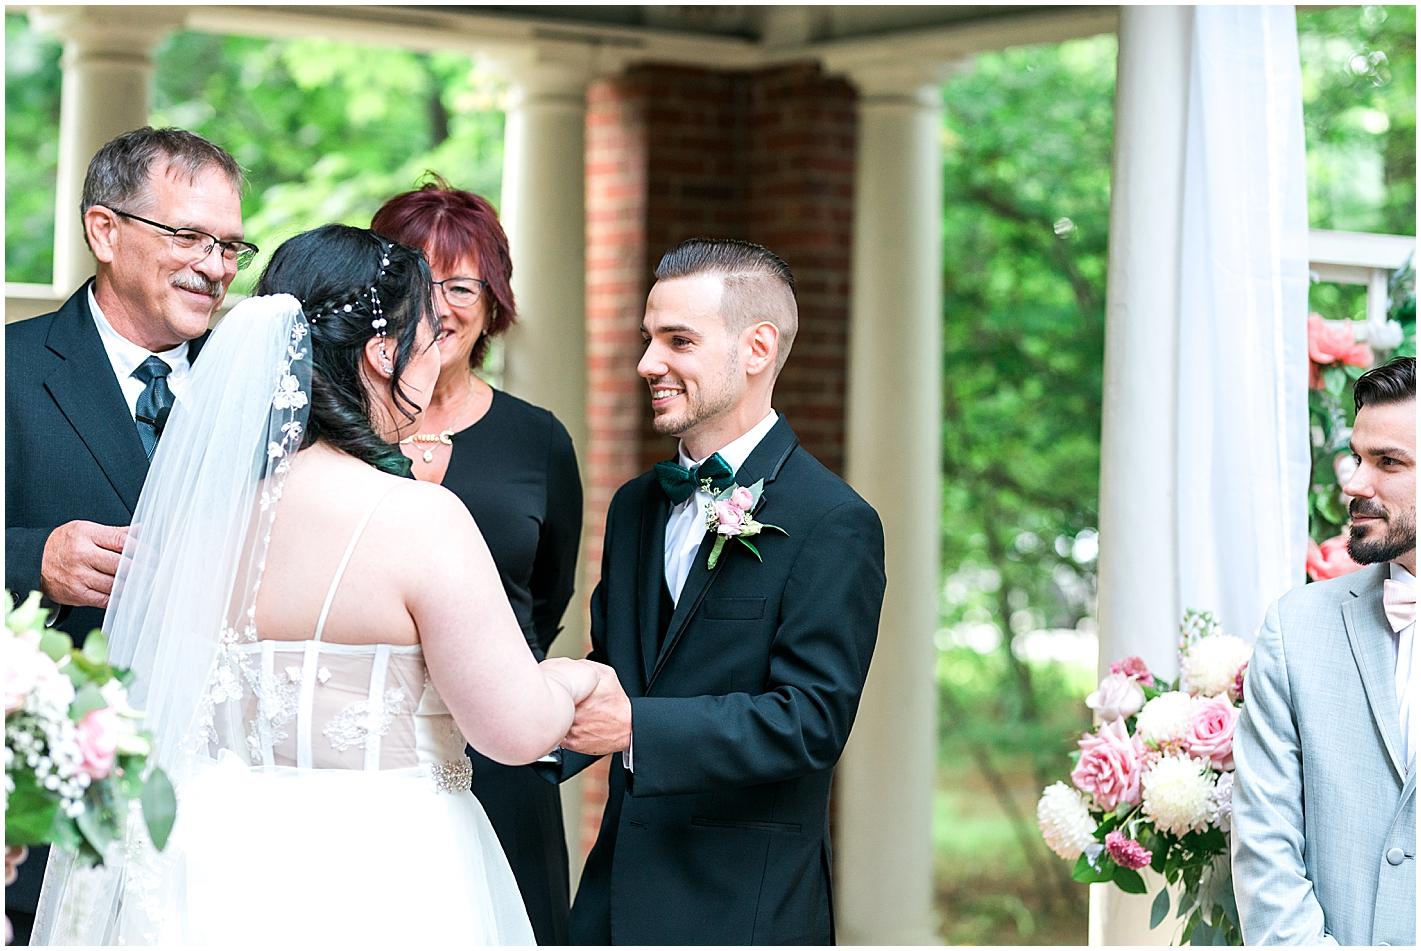 Groom Happy to See his Bride photo by Alyssa Parker Photography